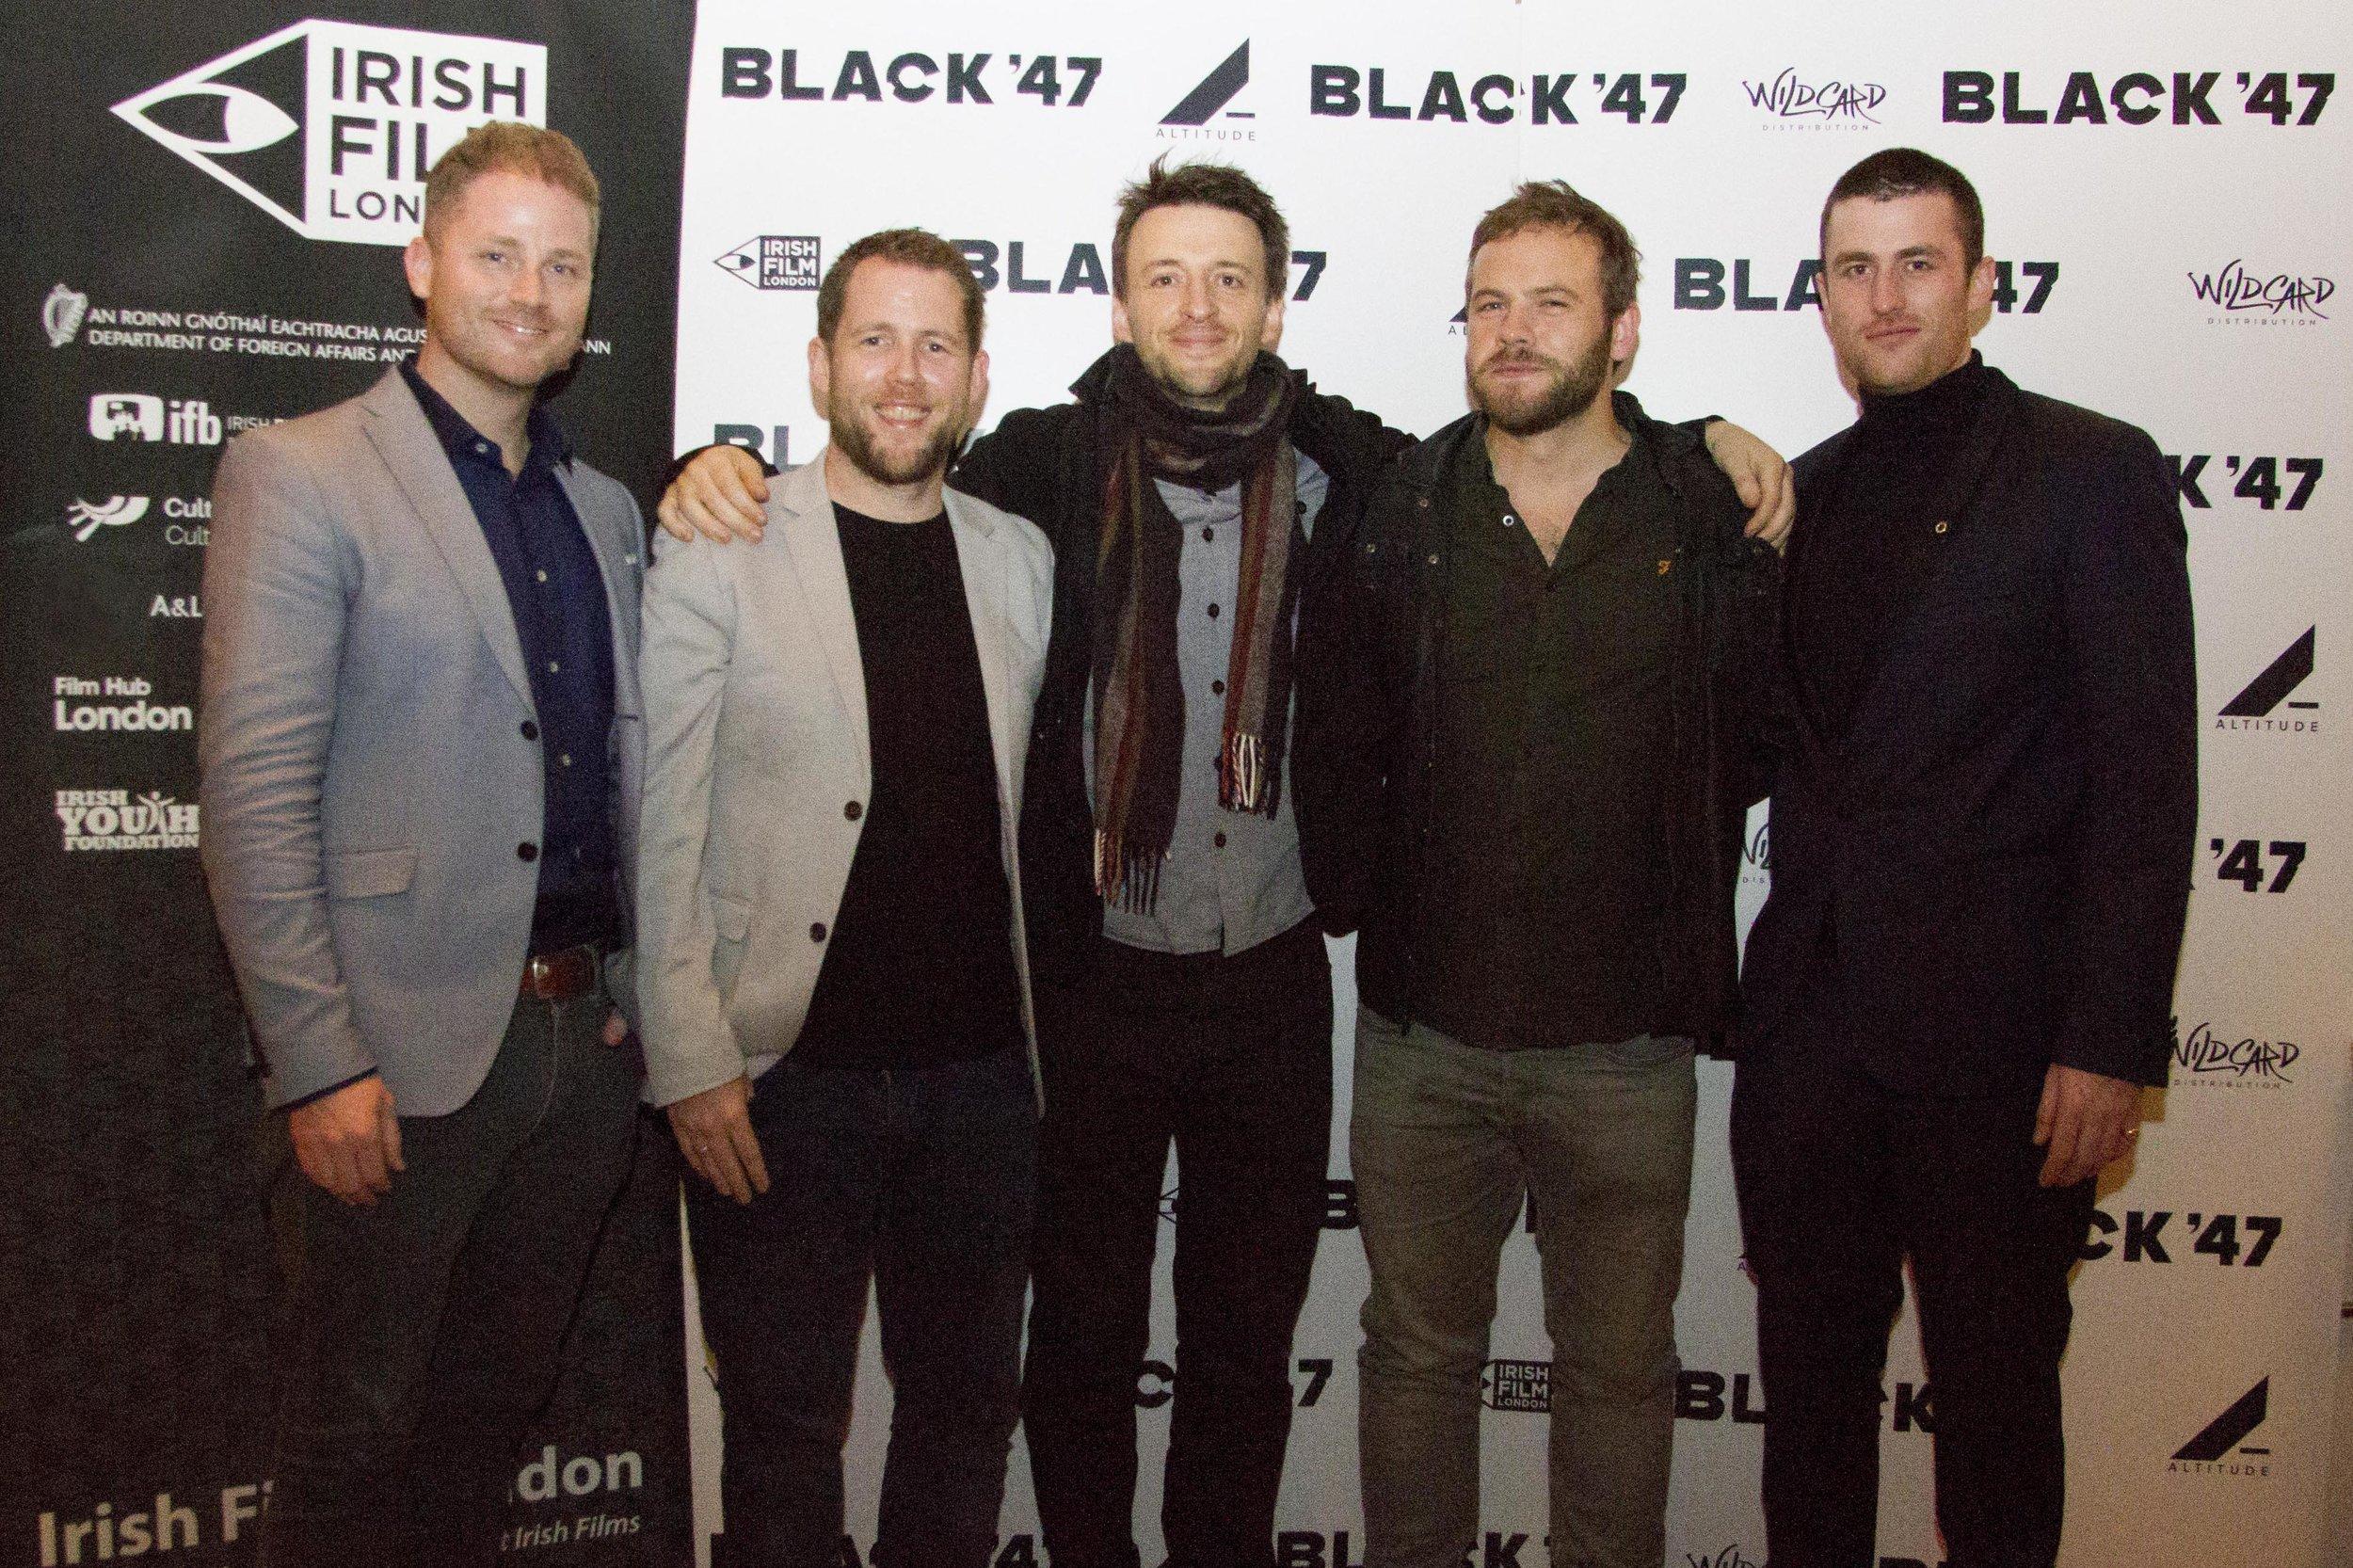 Black 47 London Premiere 2018 Photos courtesy of Noel Mullen Irish Film London 72 Jonathan Loughran Macdara Kelleher Lance Daly Moe Dunford and James Frecheville.jpg